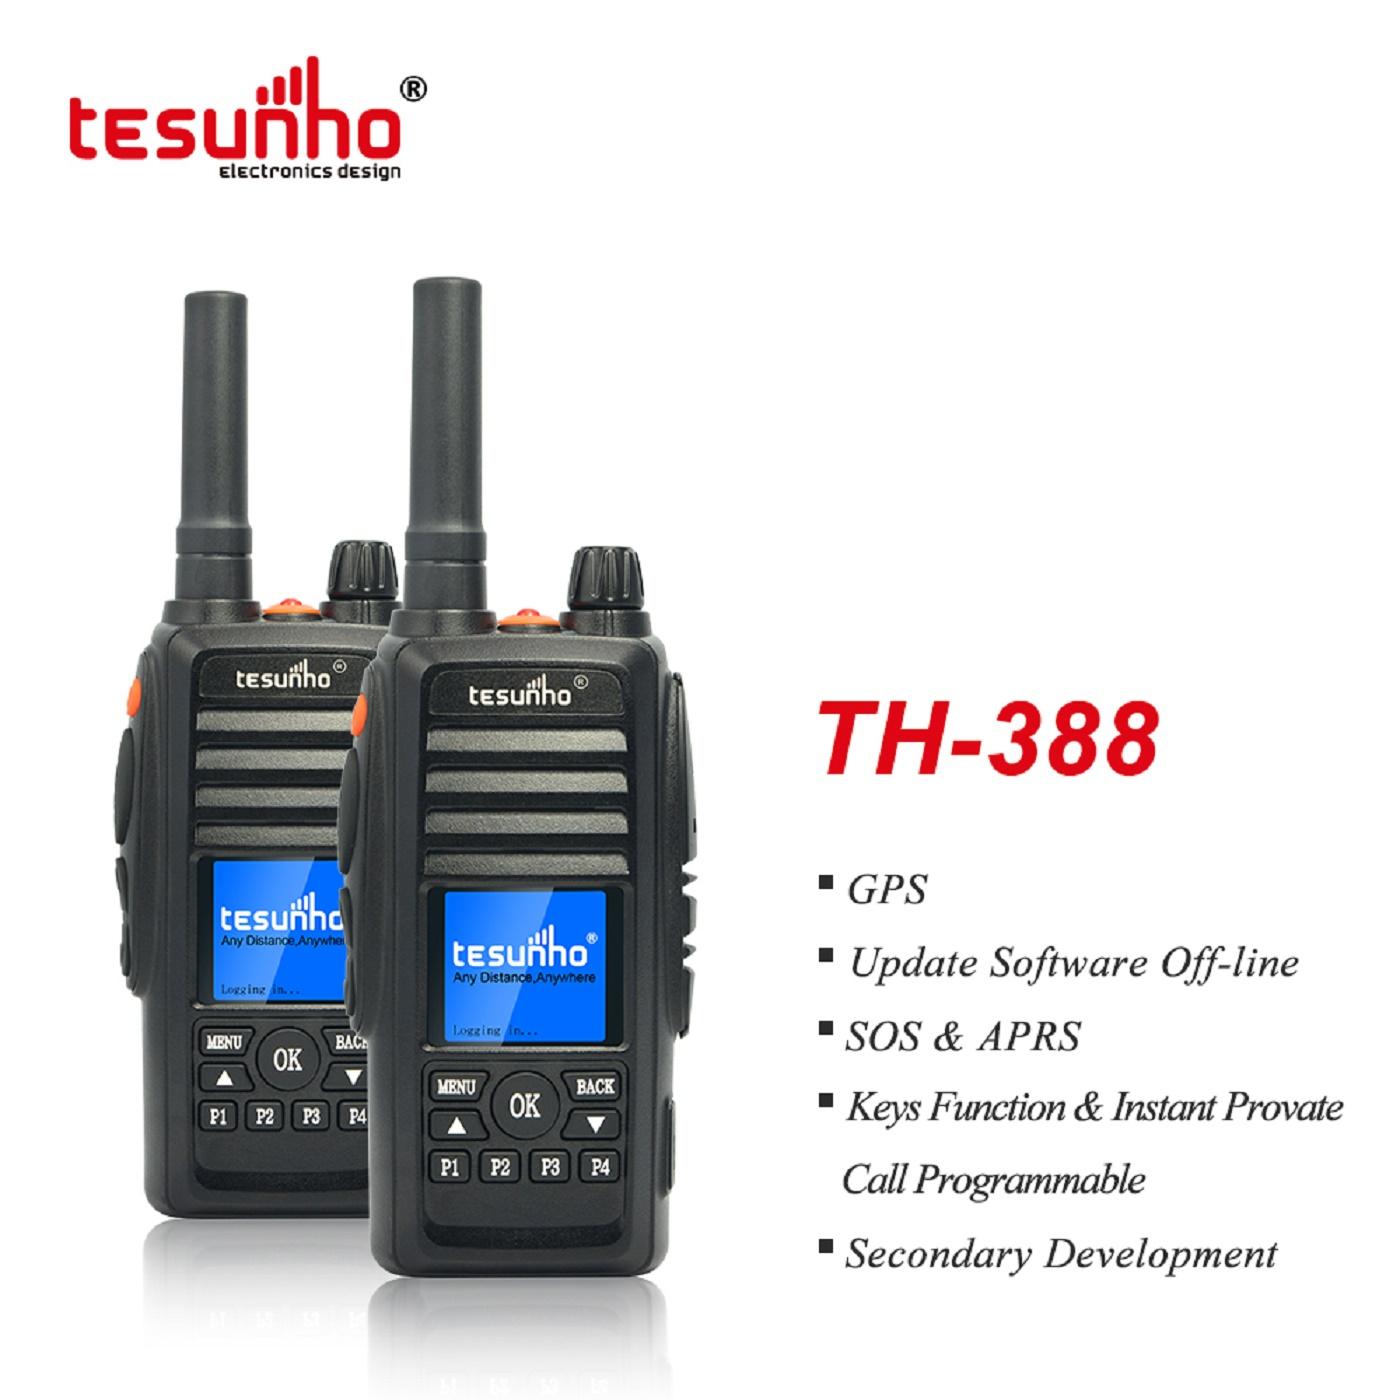 Tesunho TH-388  Fireman Customized 2 Way  Radios